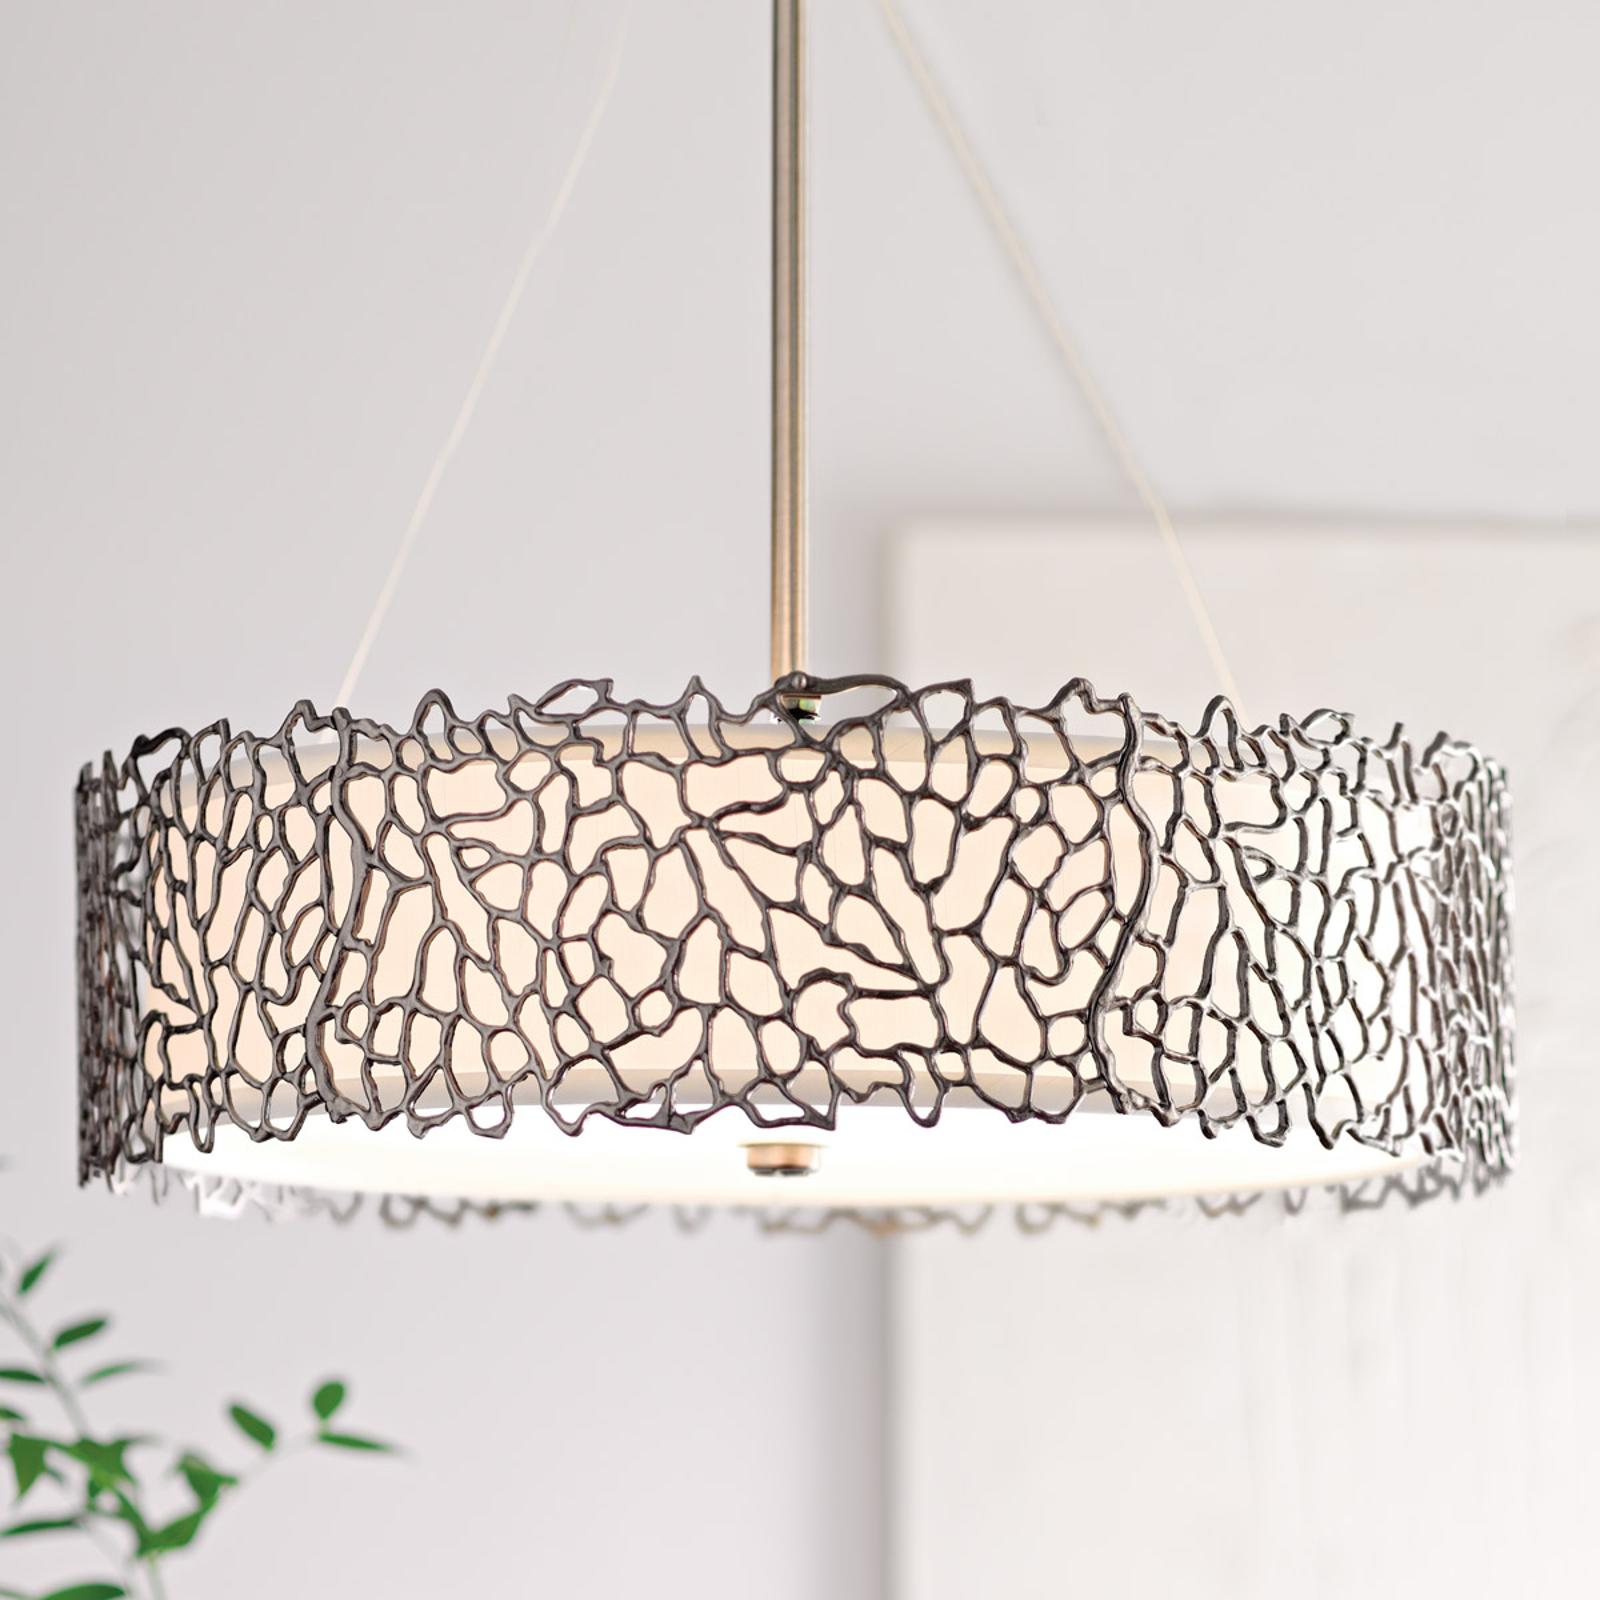 Závesná lampa Silver Coral 55,9cm_3048279_1